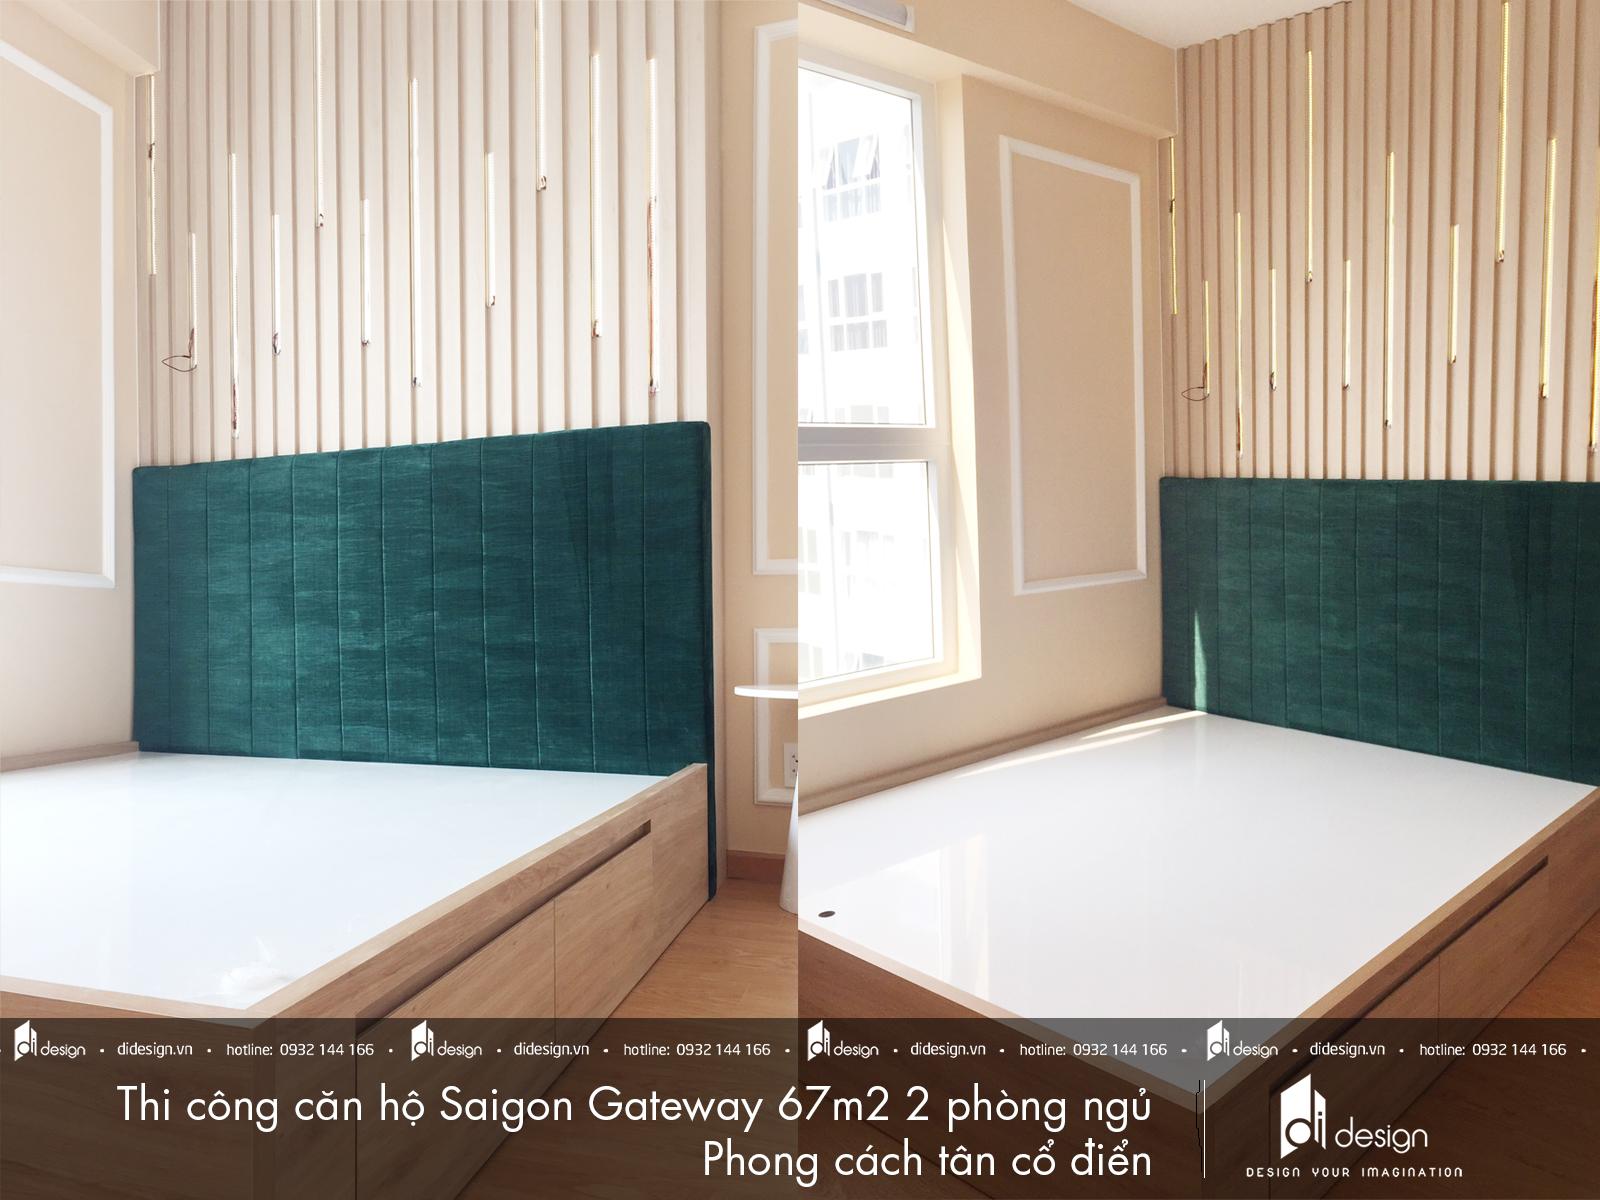 thi-cong-noi-that-can-ho-Saigon-Gateway-67m2-8-phong-ngu.jpg